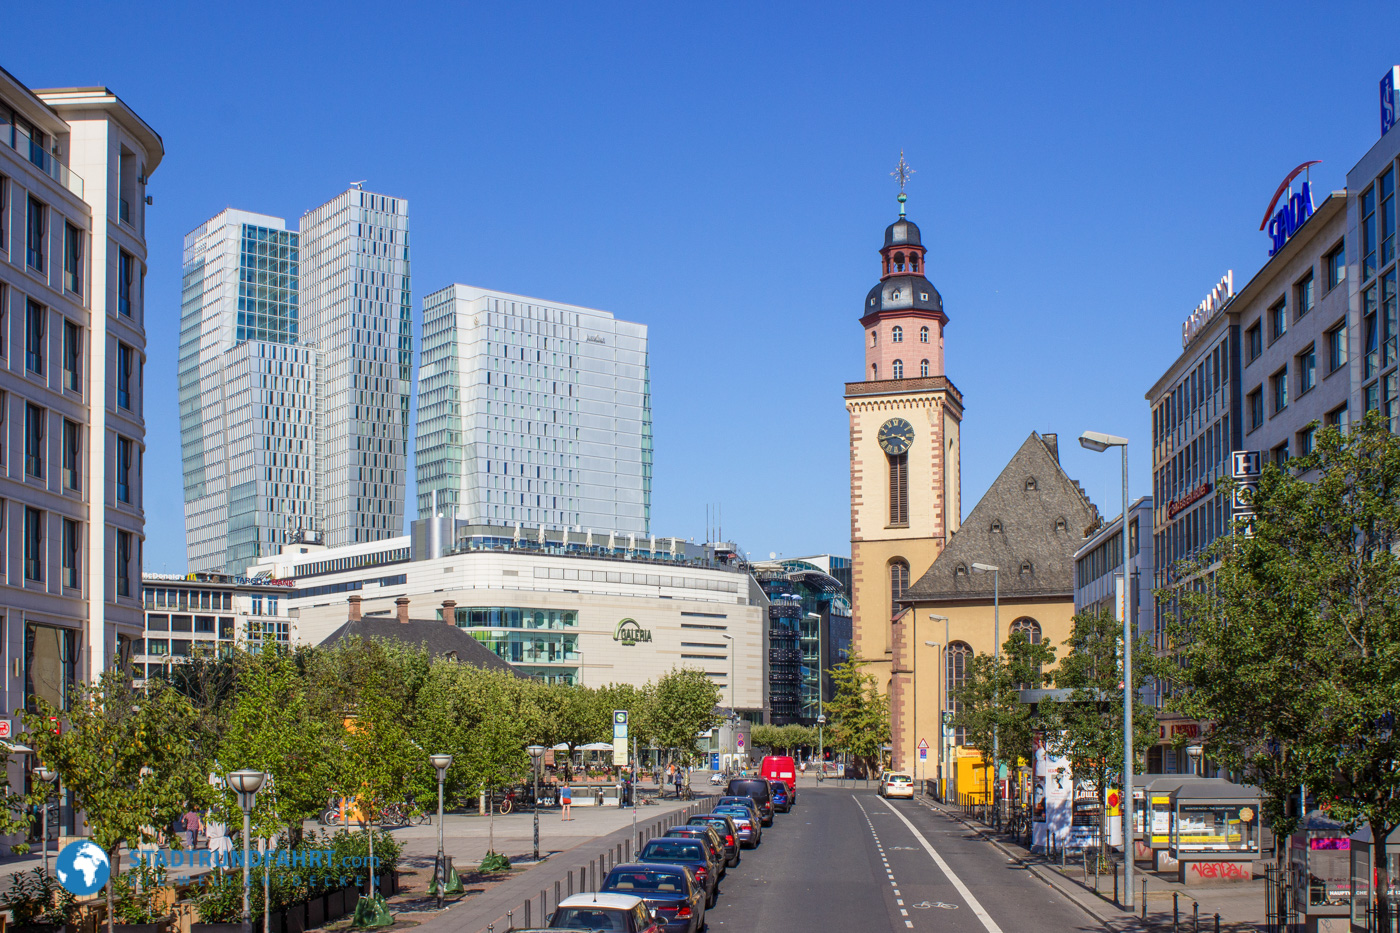 frankfurtstadtrundfahrt